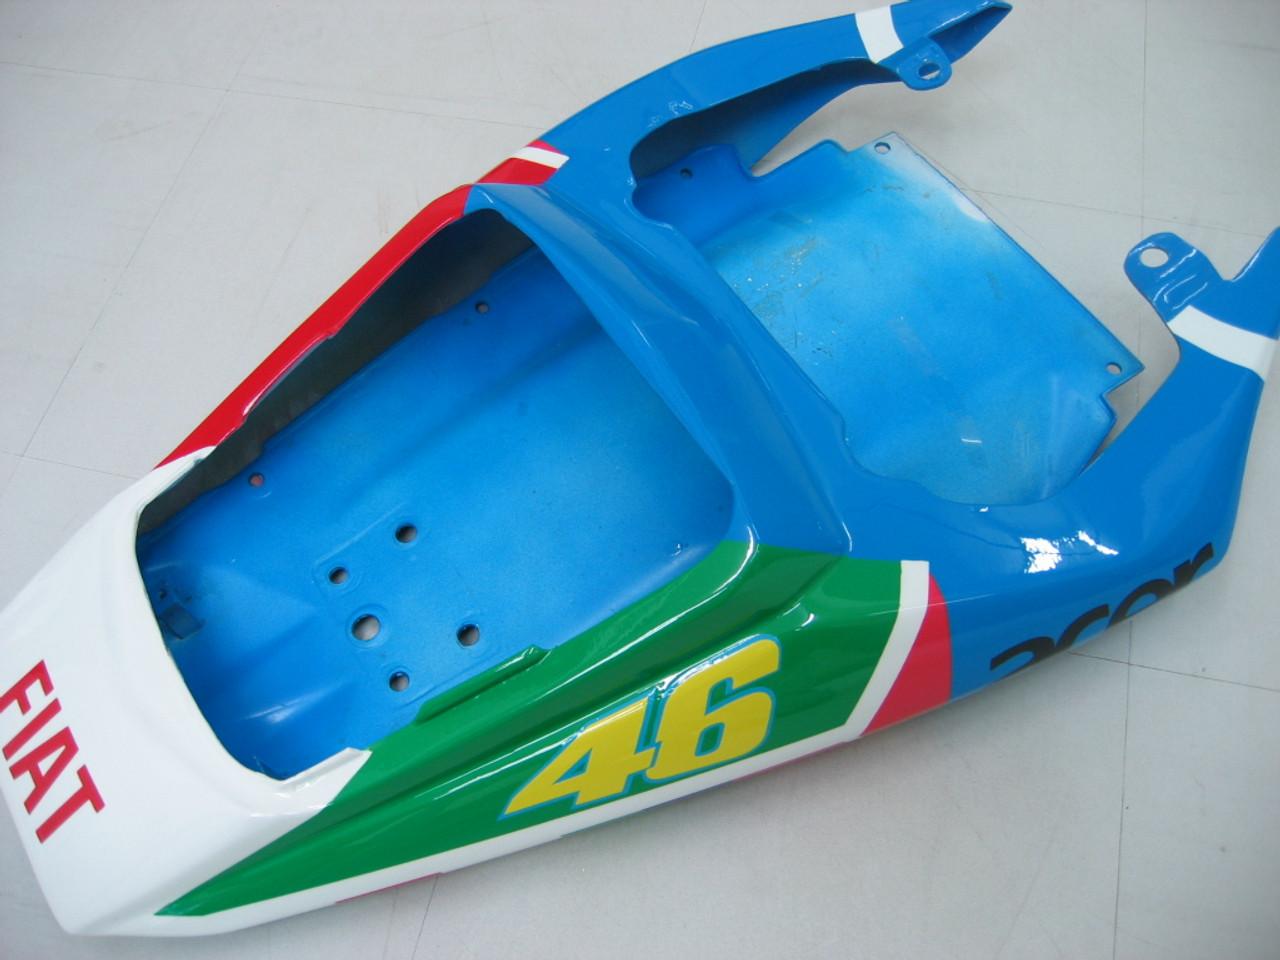 Fairings Yamaha YZF-R6 Multi-Color  R6 Racing (2003-2005)